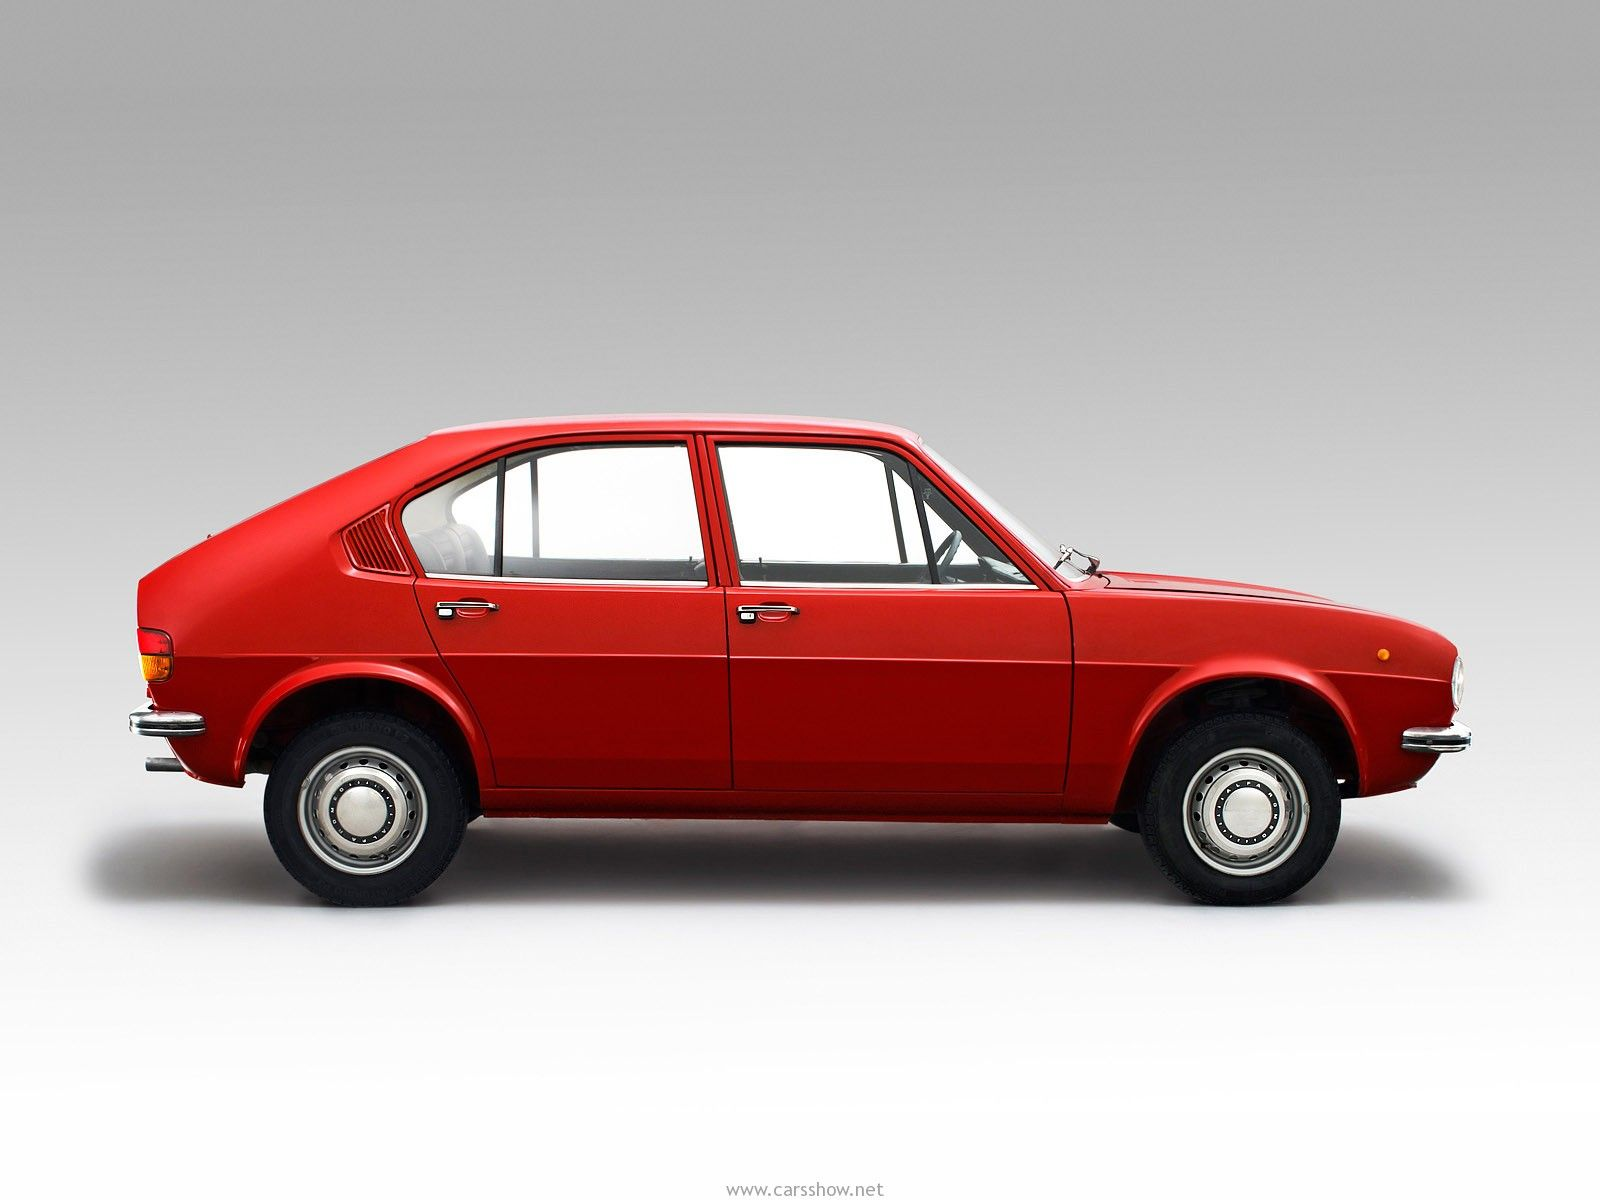 AlfasudAutomobile Alfa Voiture 1971 Romeo Et Roméo gYyvf76b